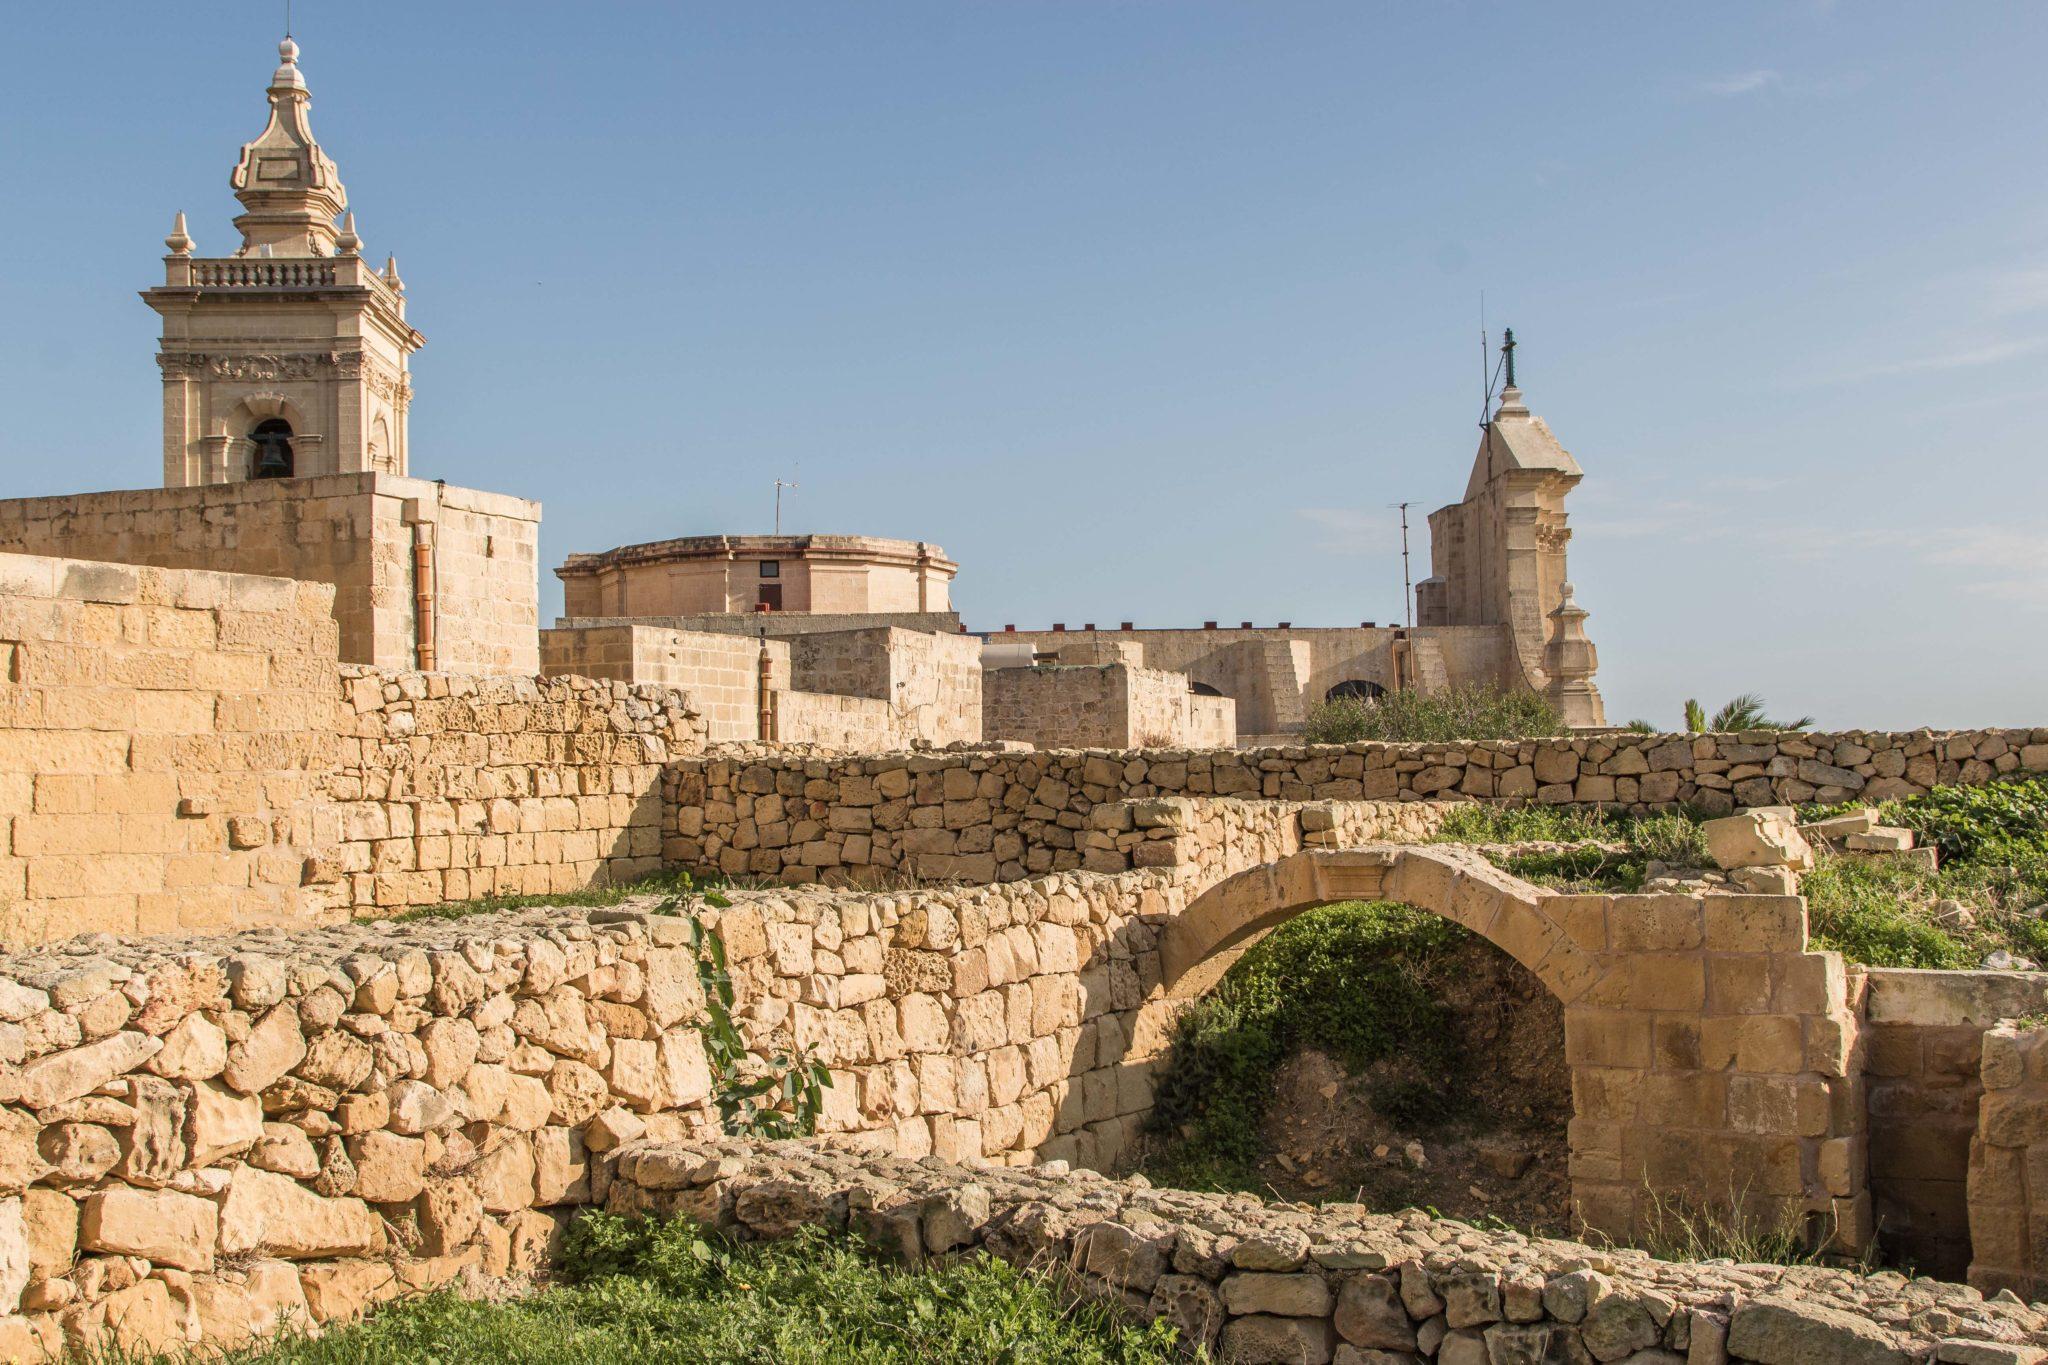 Go for Gozo – Victoria i Cittadella